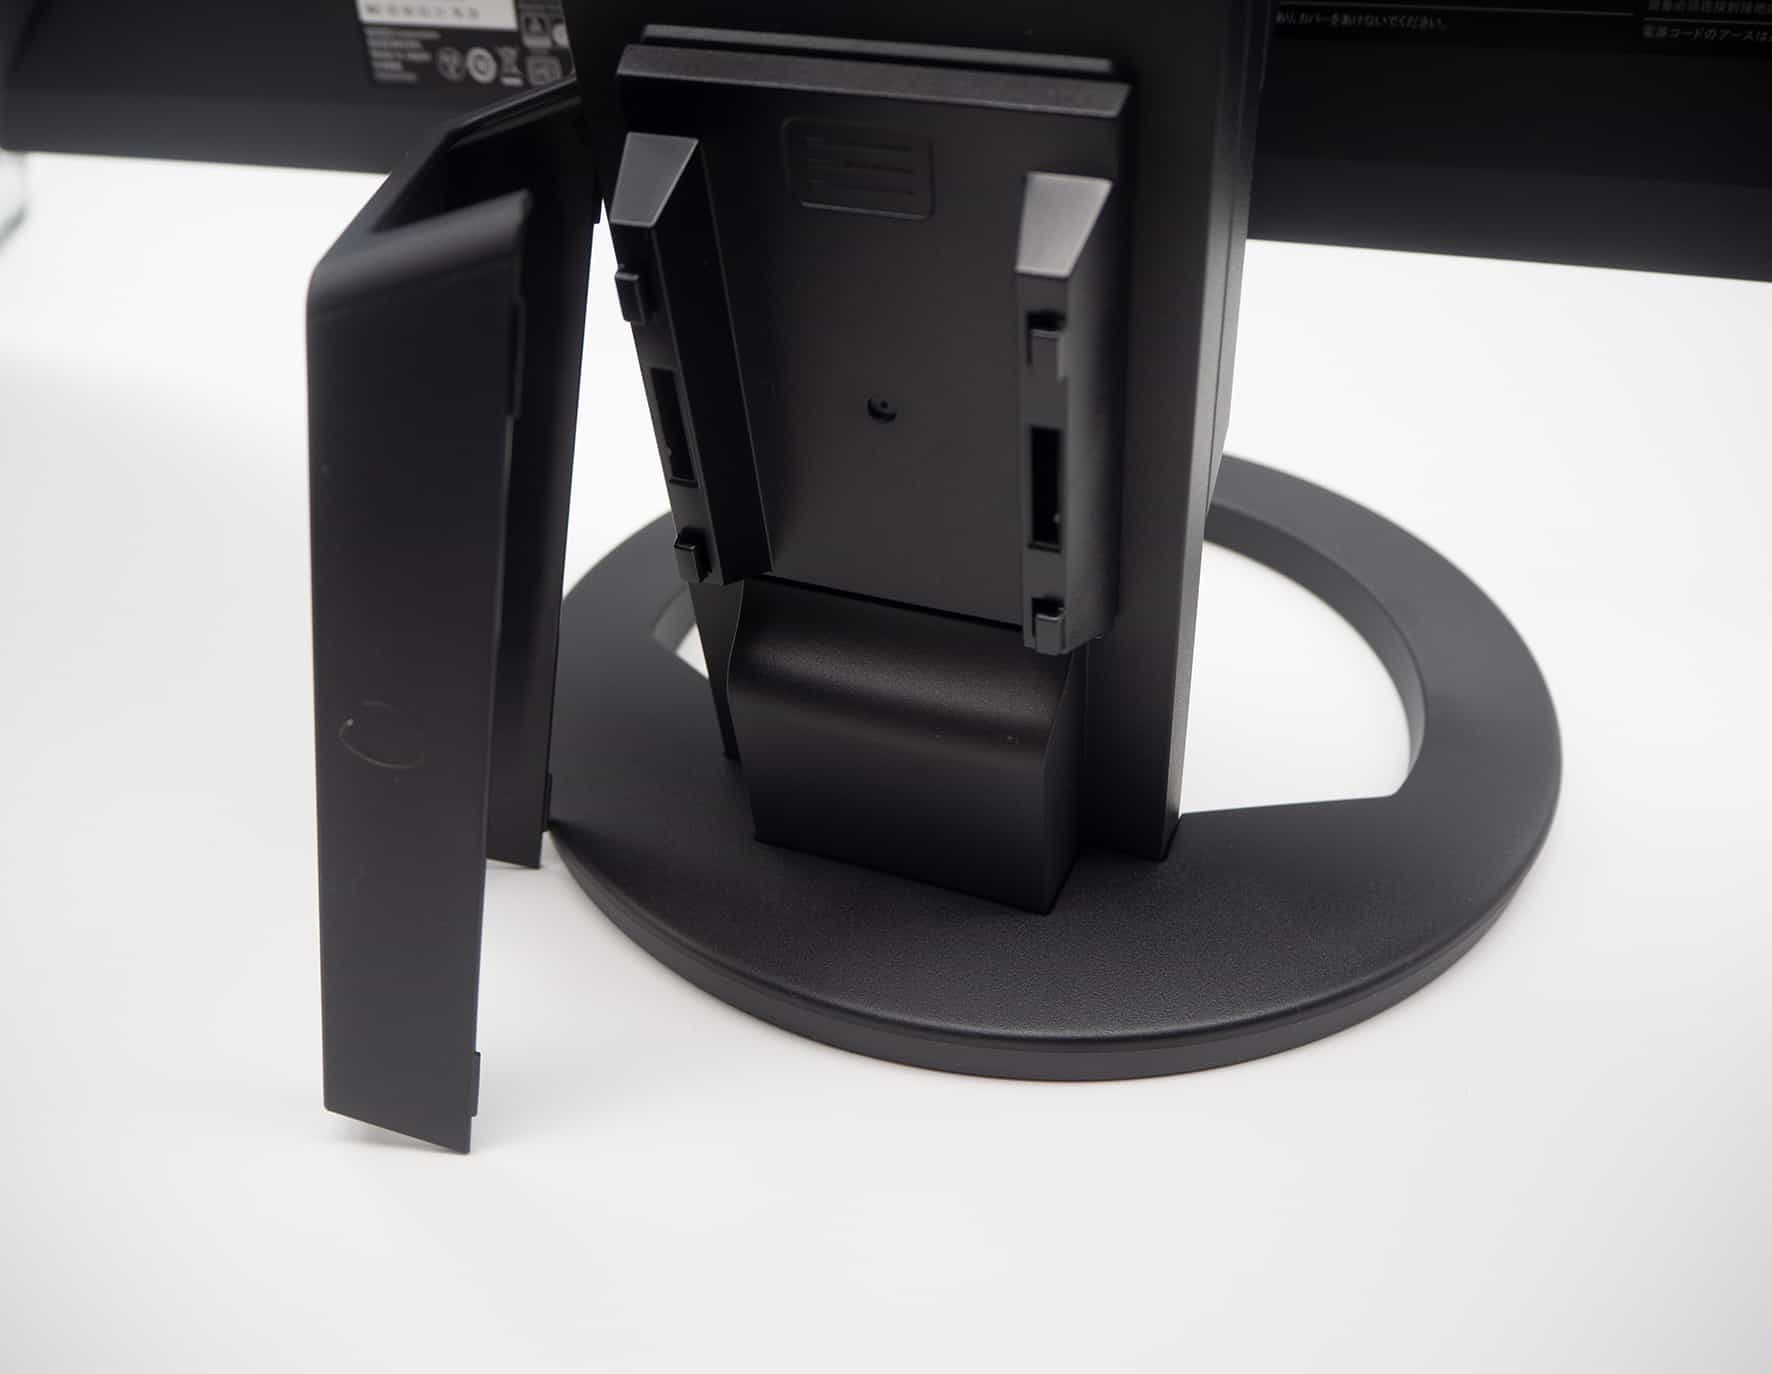 Eizo Monitor Kabelkanal im Test